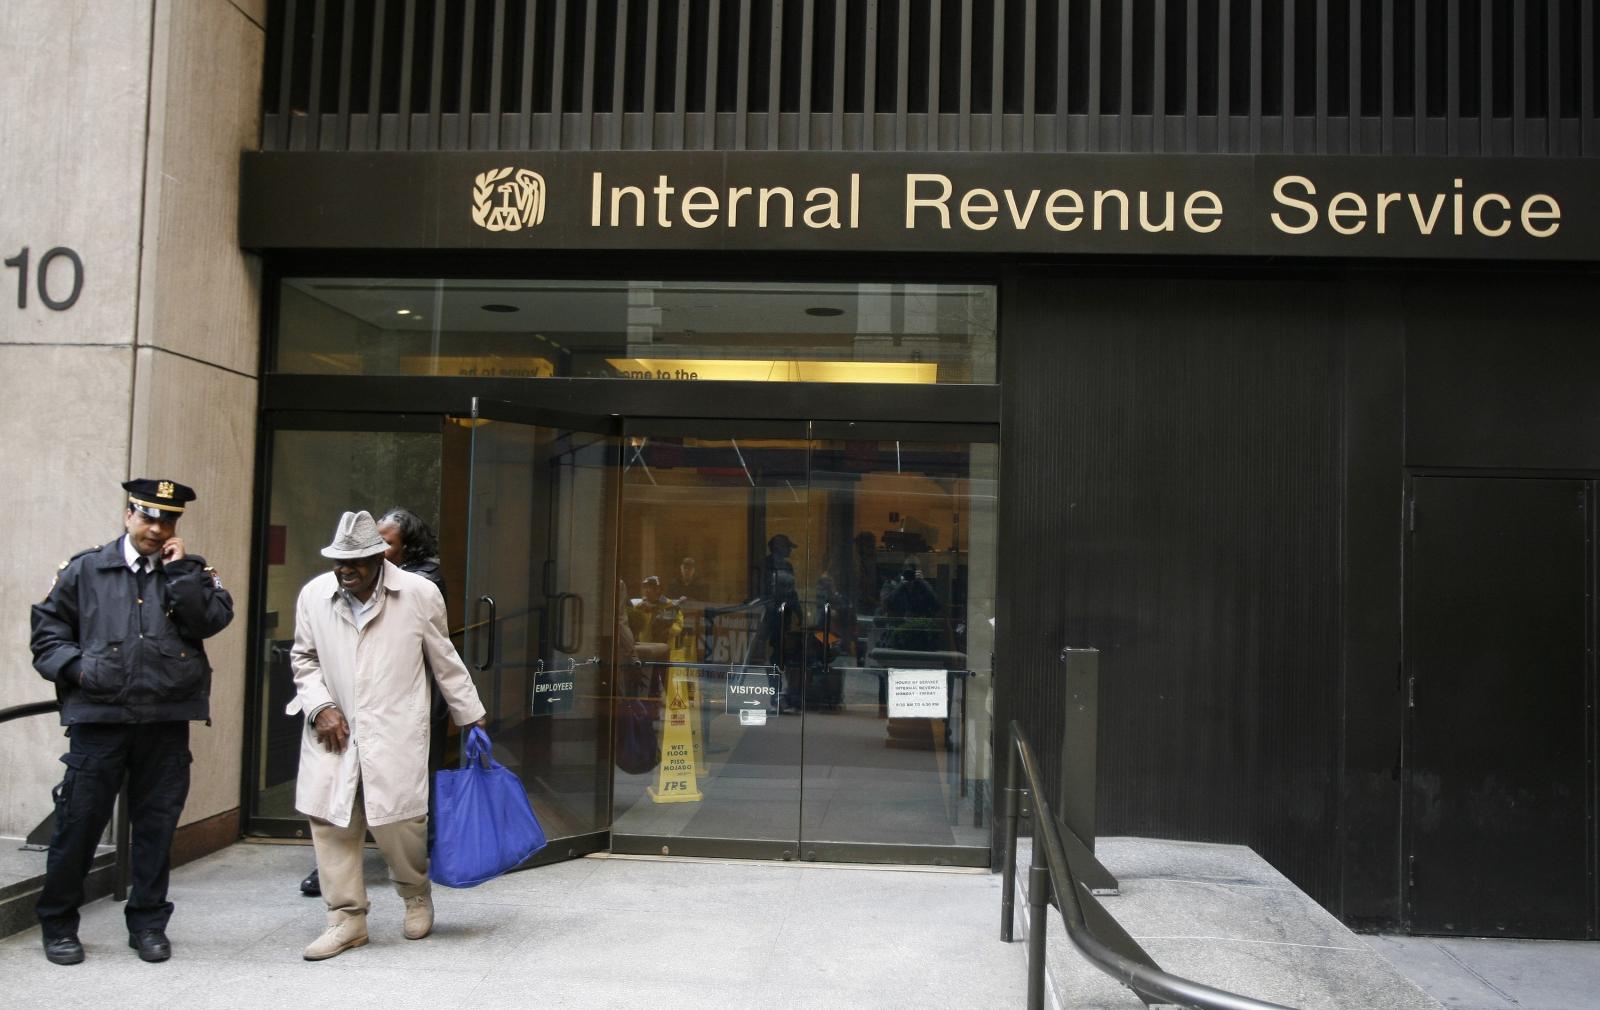 The IRS (US Inland Revenue Service)